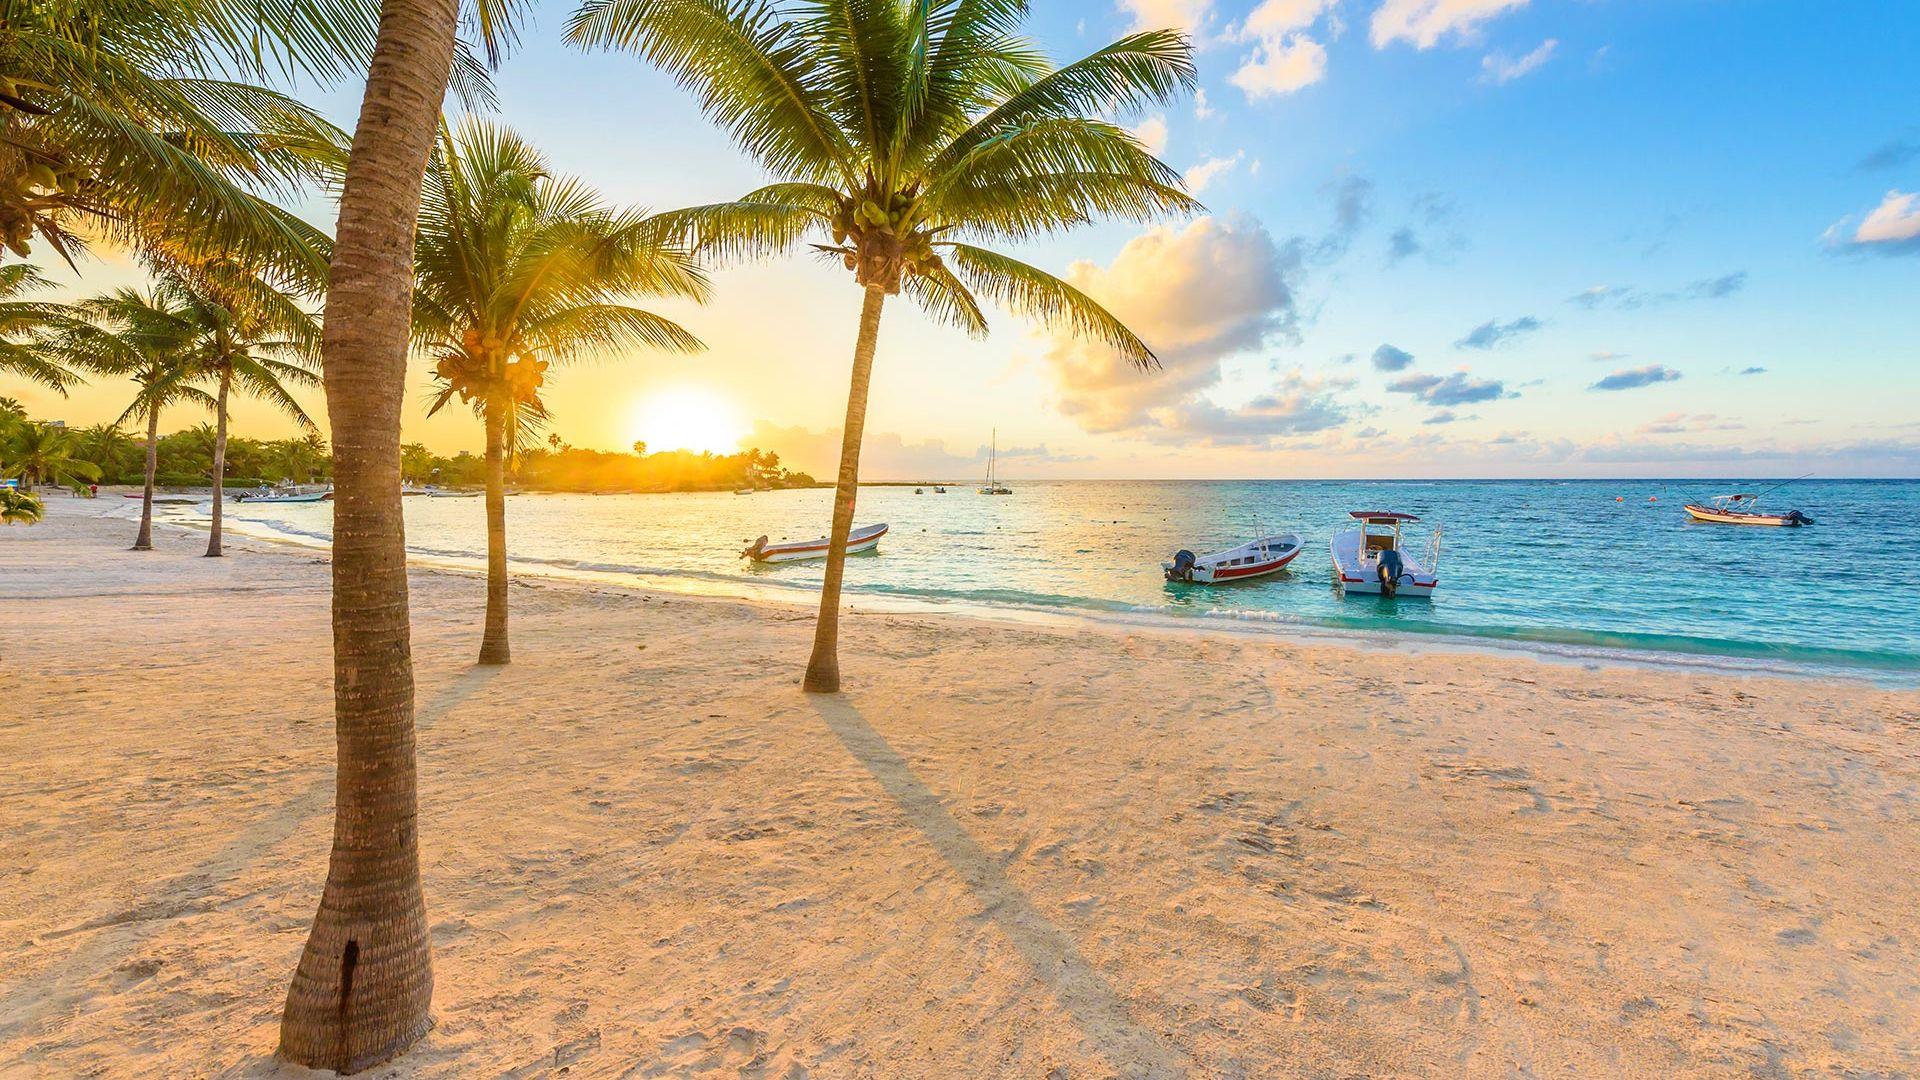 Sejur plaja Cancun si Riviera Maya, Mexic, 11 zile - mai 2022